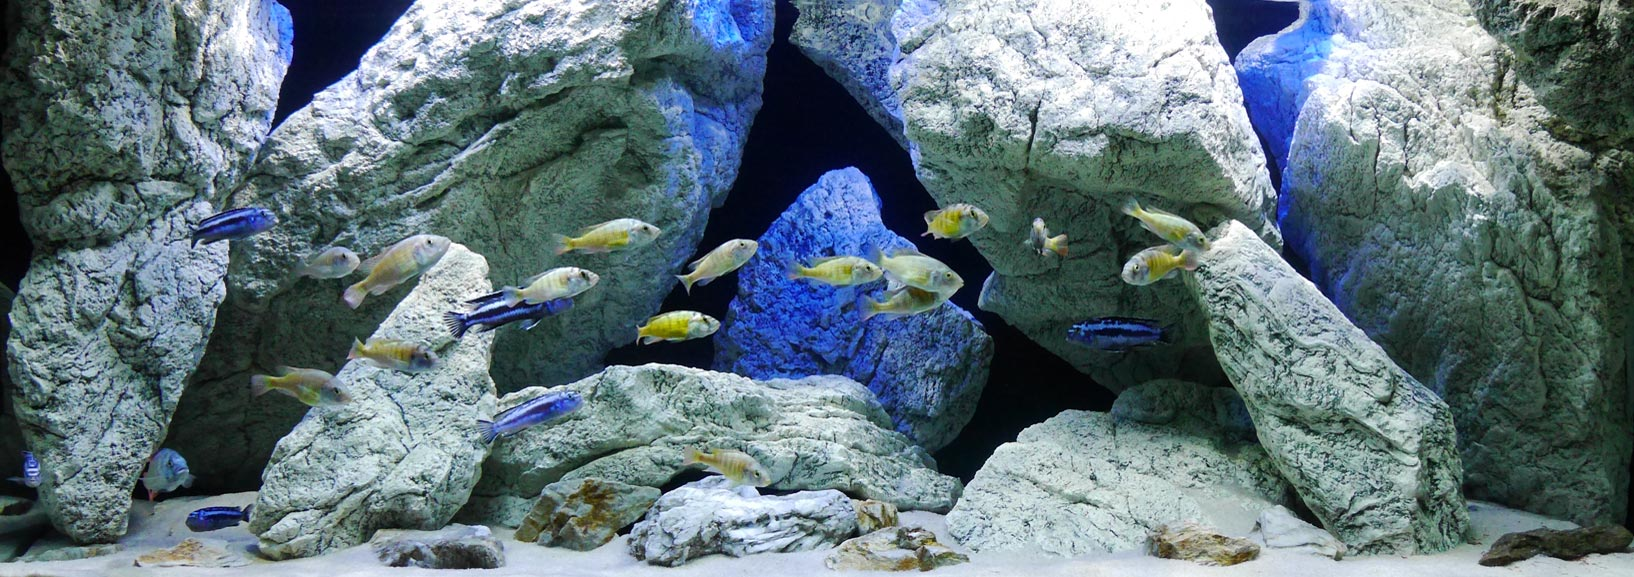 Kameny do akvária 3D